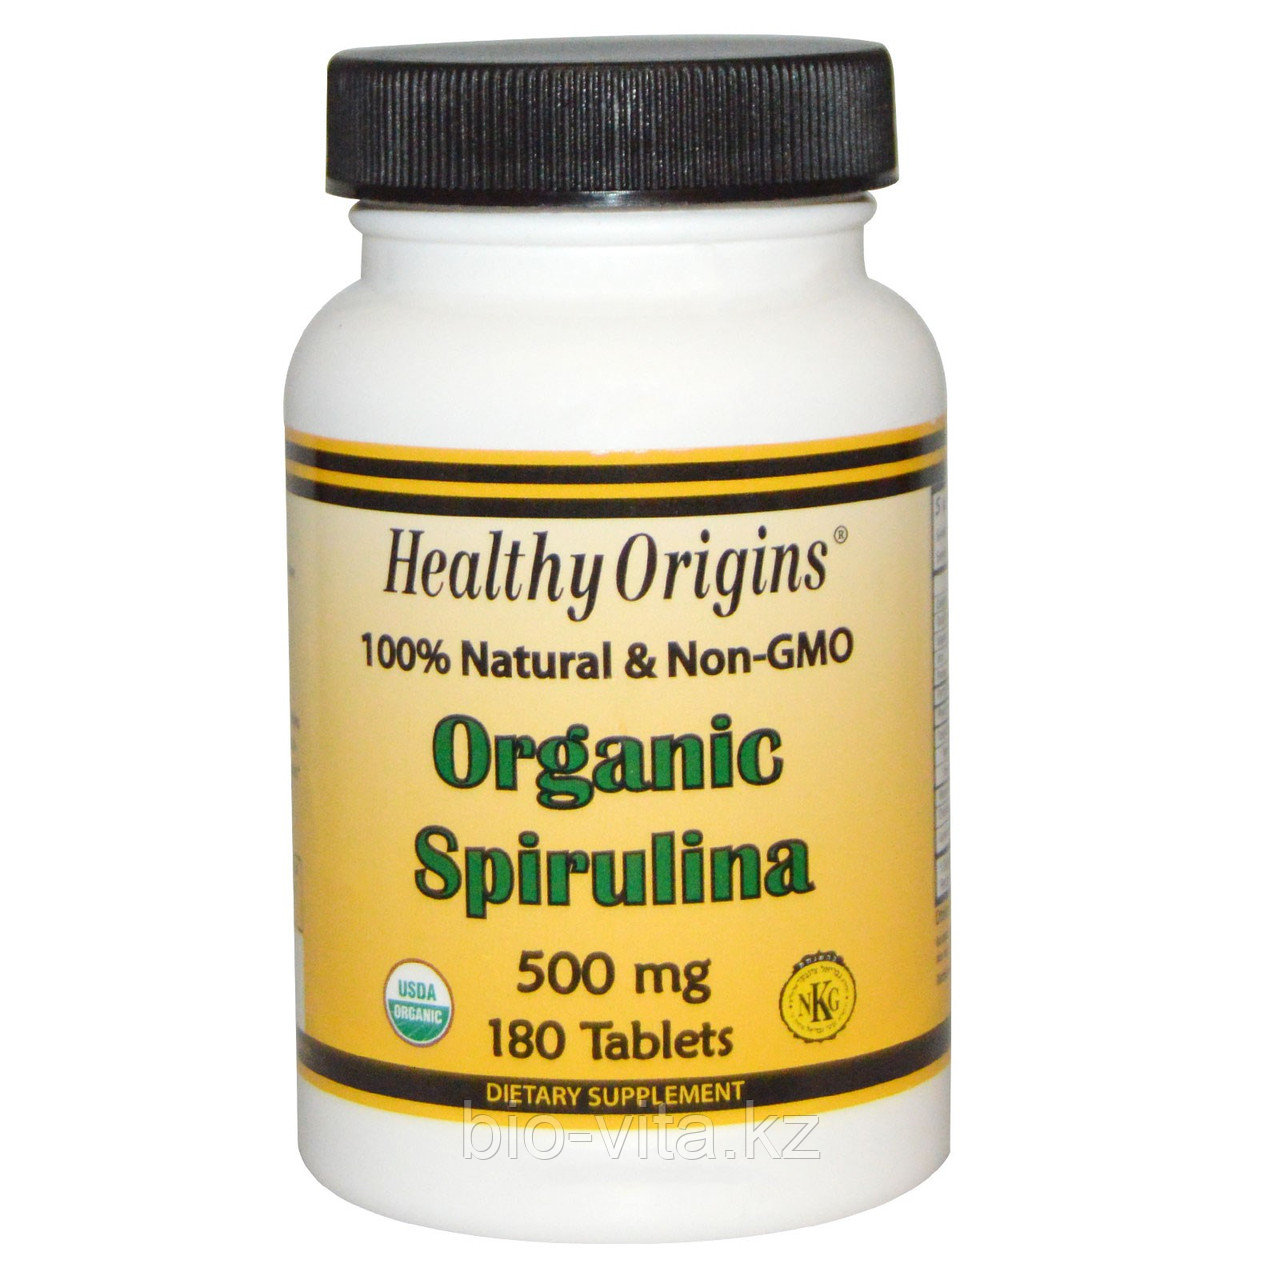 Спирулина. Healthy Origins, Органическая спирулина, 500 мг, 180 таблеток. Без ГМО.